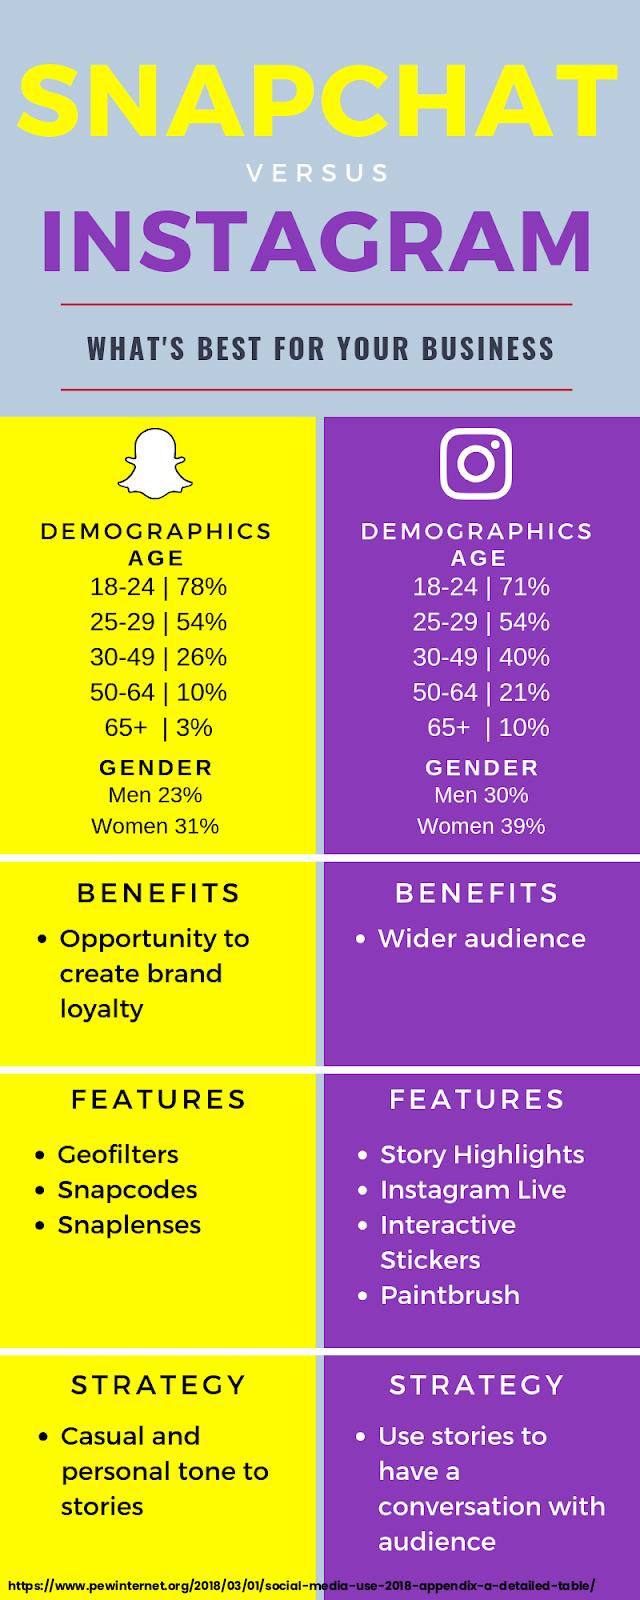 Snapchat vs Instagram Infographic